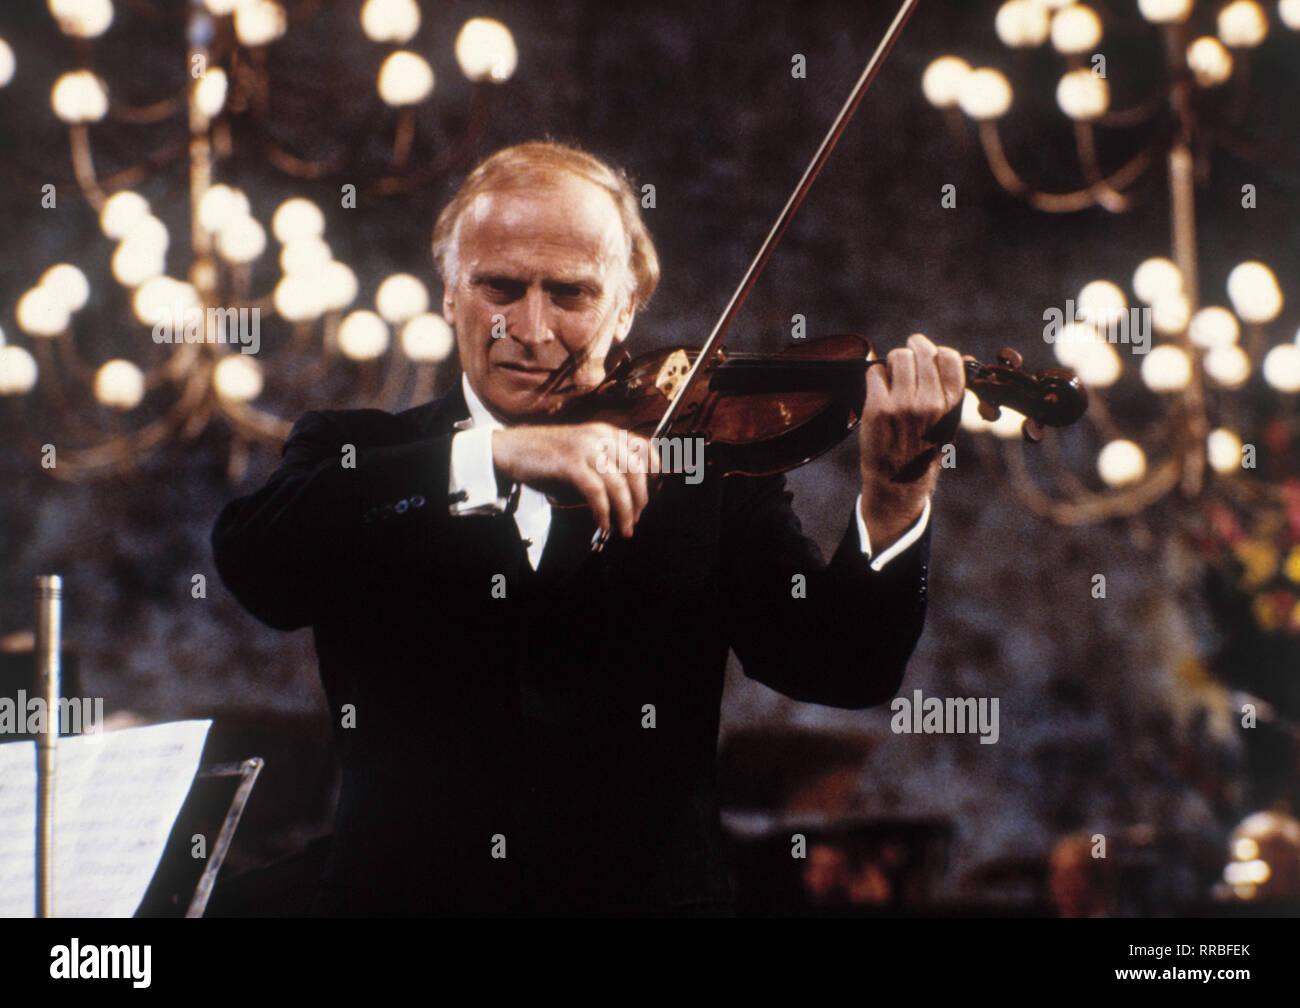 Der berühmte Geiger Yehudi Menuhin, 1987. Famous violinist Yehudi Menuhin, 1987. / Überschrift: Yehudi Menuhin - Stock Image